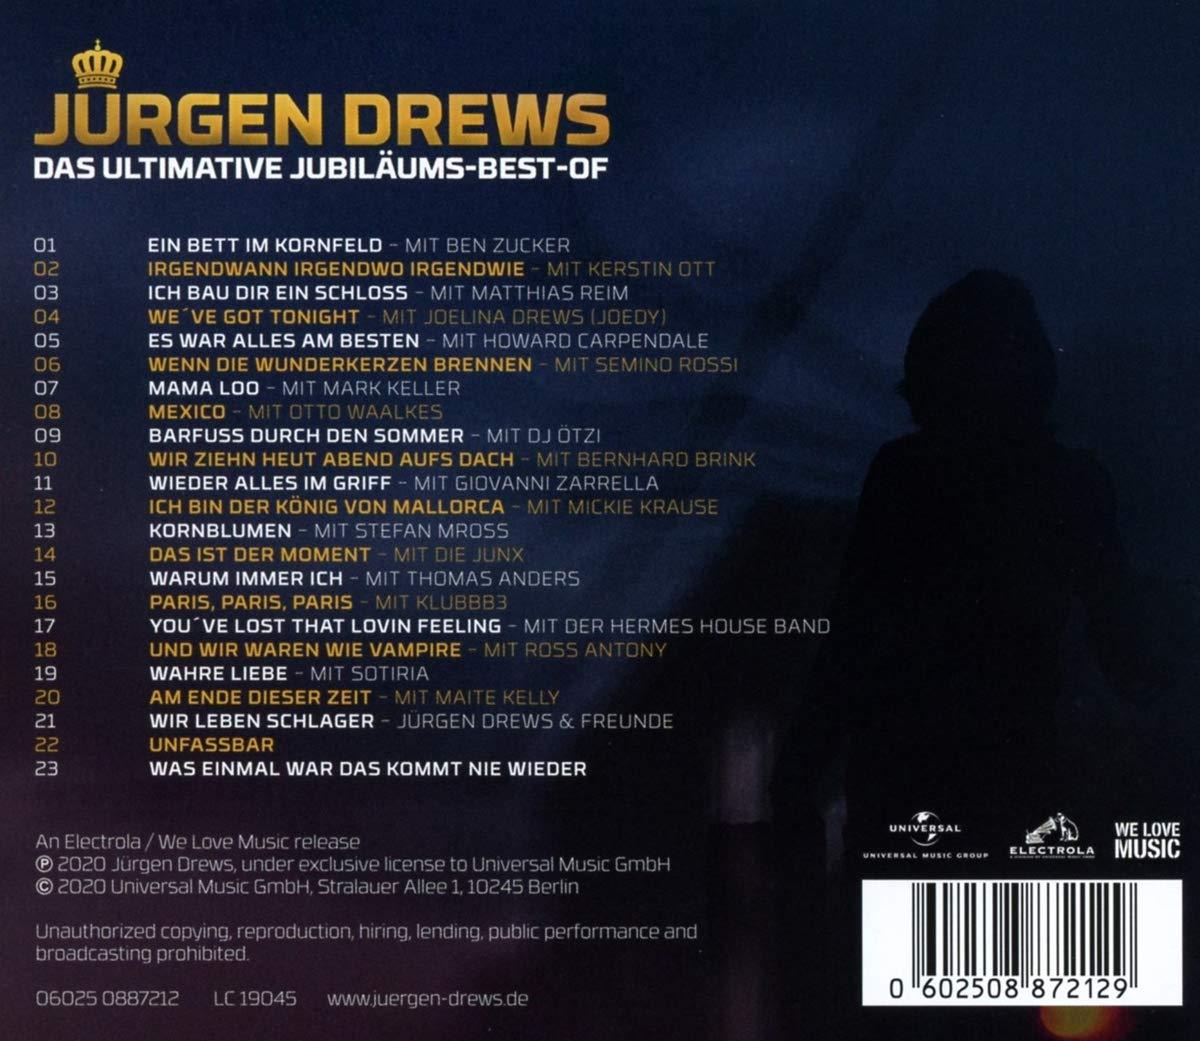 Drews Jurgen Das Ultimative Jubilaums Best Of Amazon Com Music